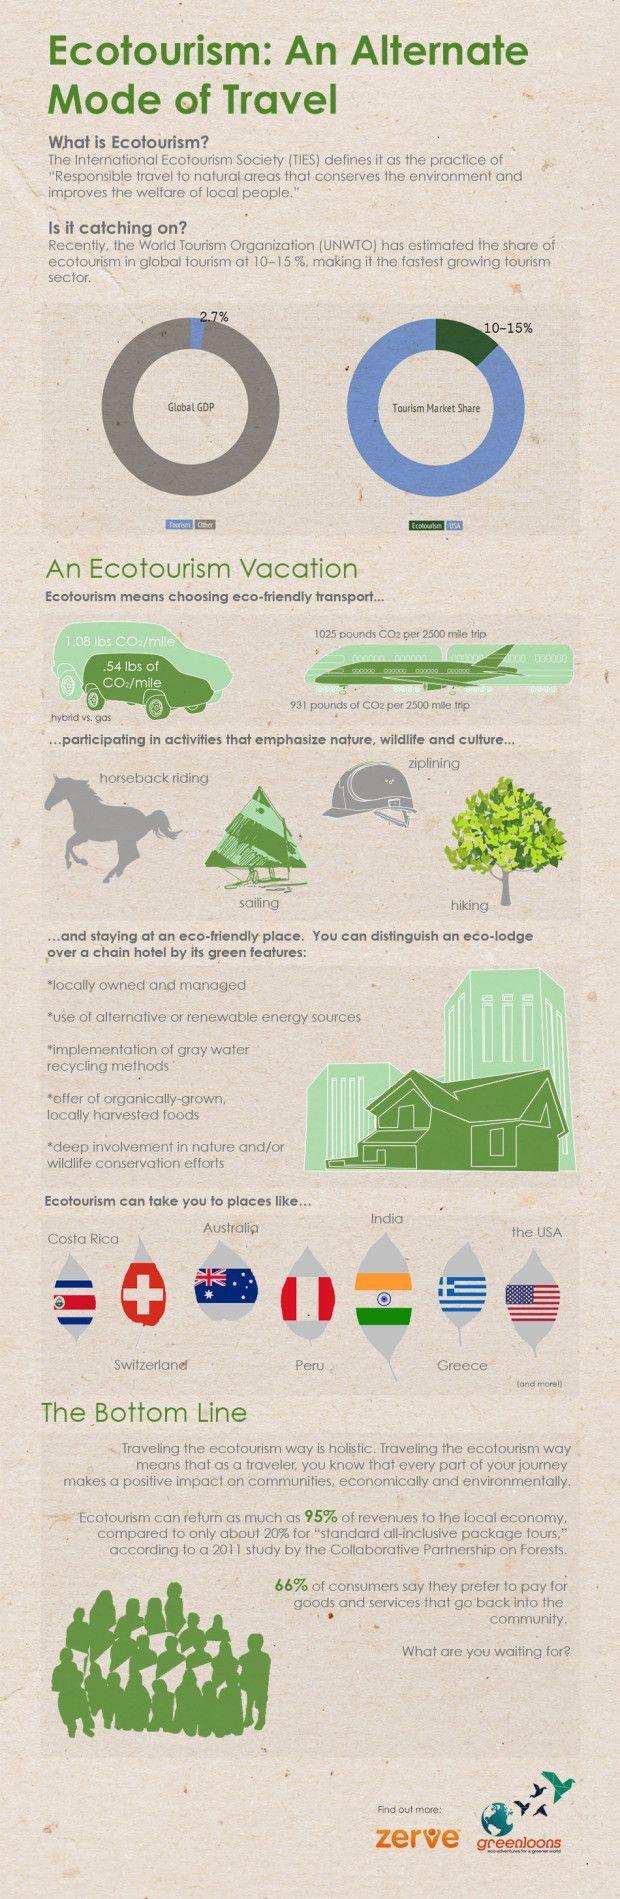 Ecoturismo: un modo alternativo de viajar #infografia